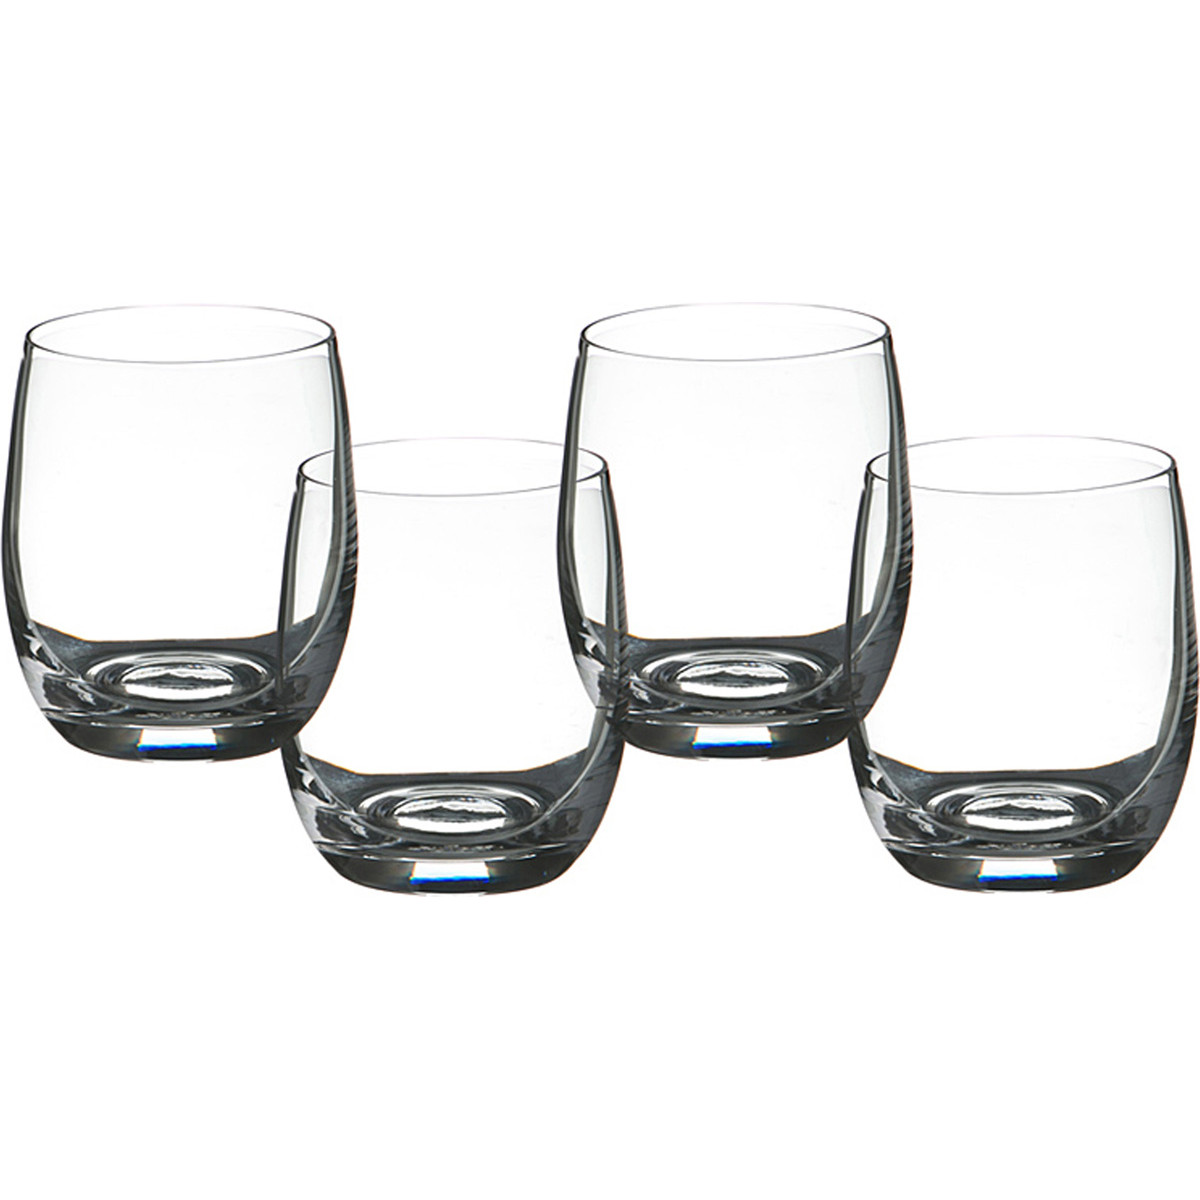 {} Bohemia Crystal Набор стаканов для виски Carlyle  (10 см - 4 шт) набор для кофе crystal bohemia mokko 4 предмета